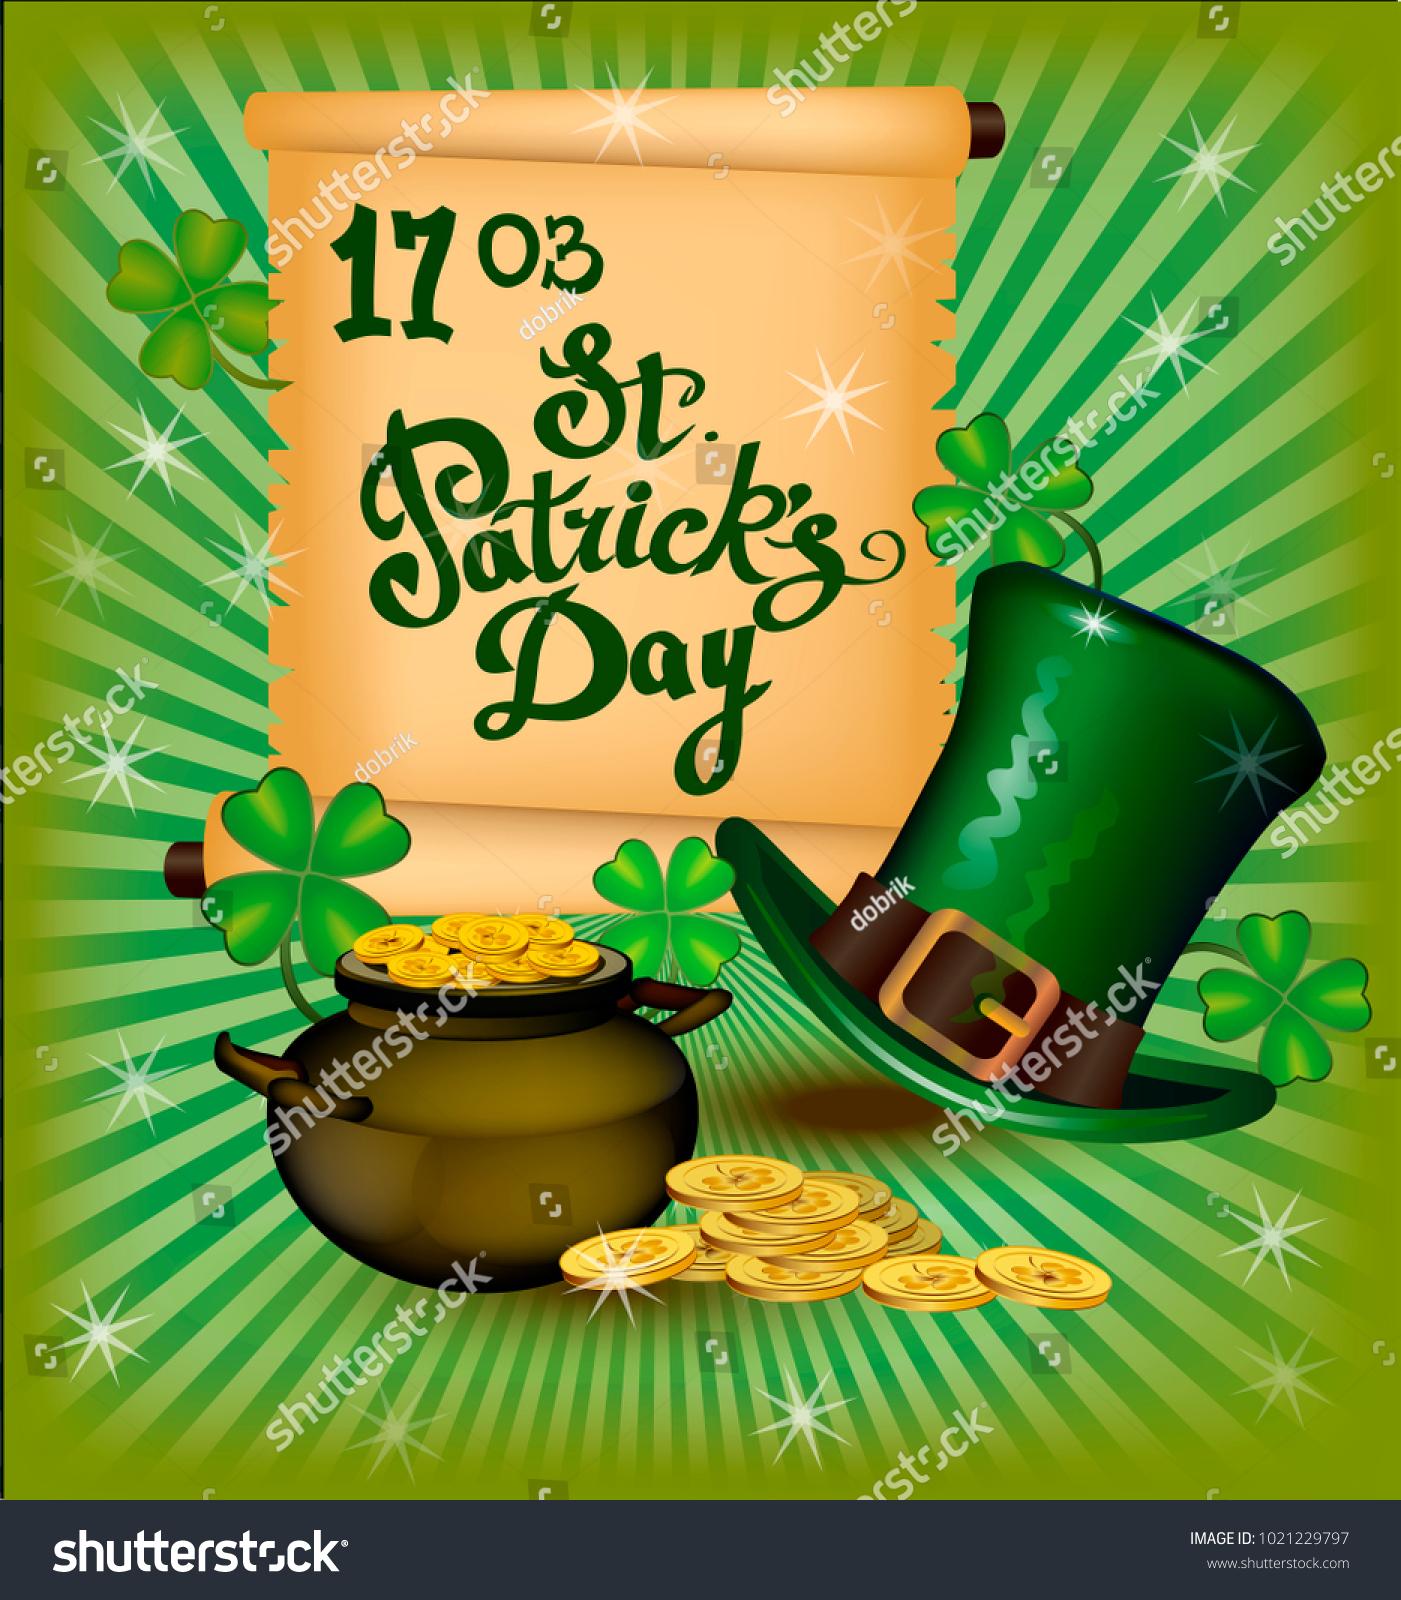 St Patricks Day Greeting Vector Illustration Stock Vector 1021229797